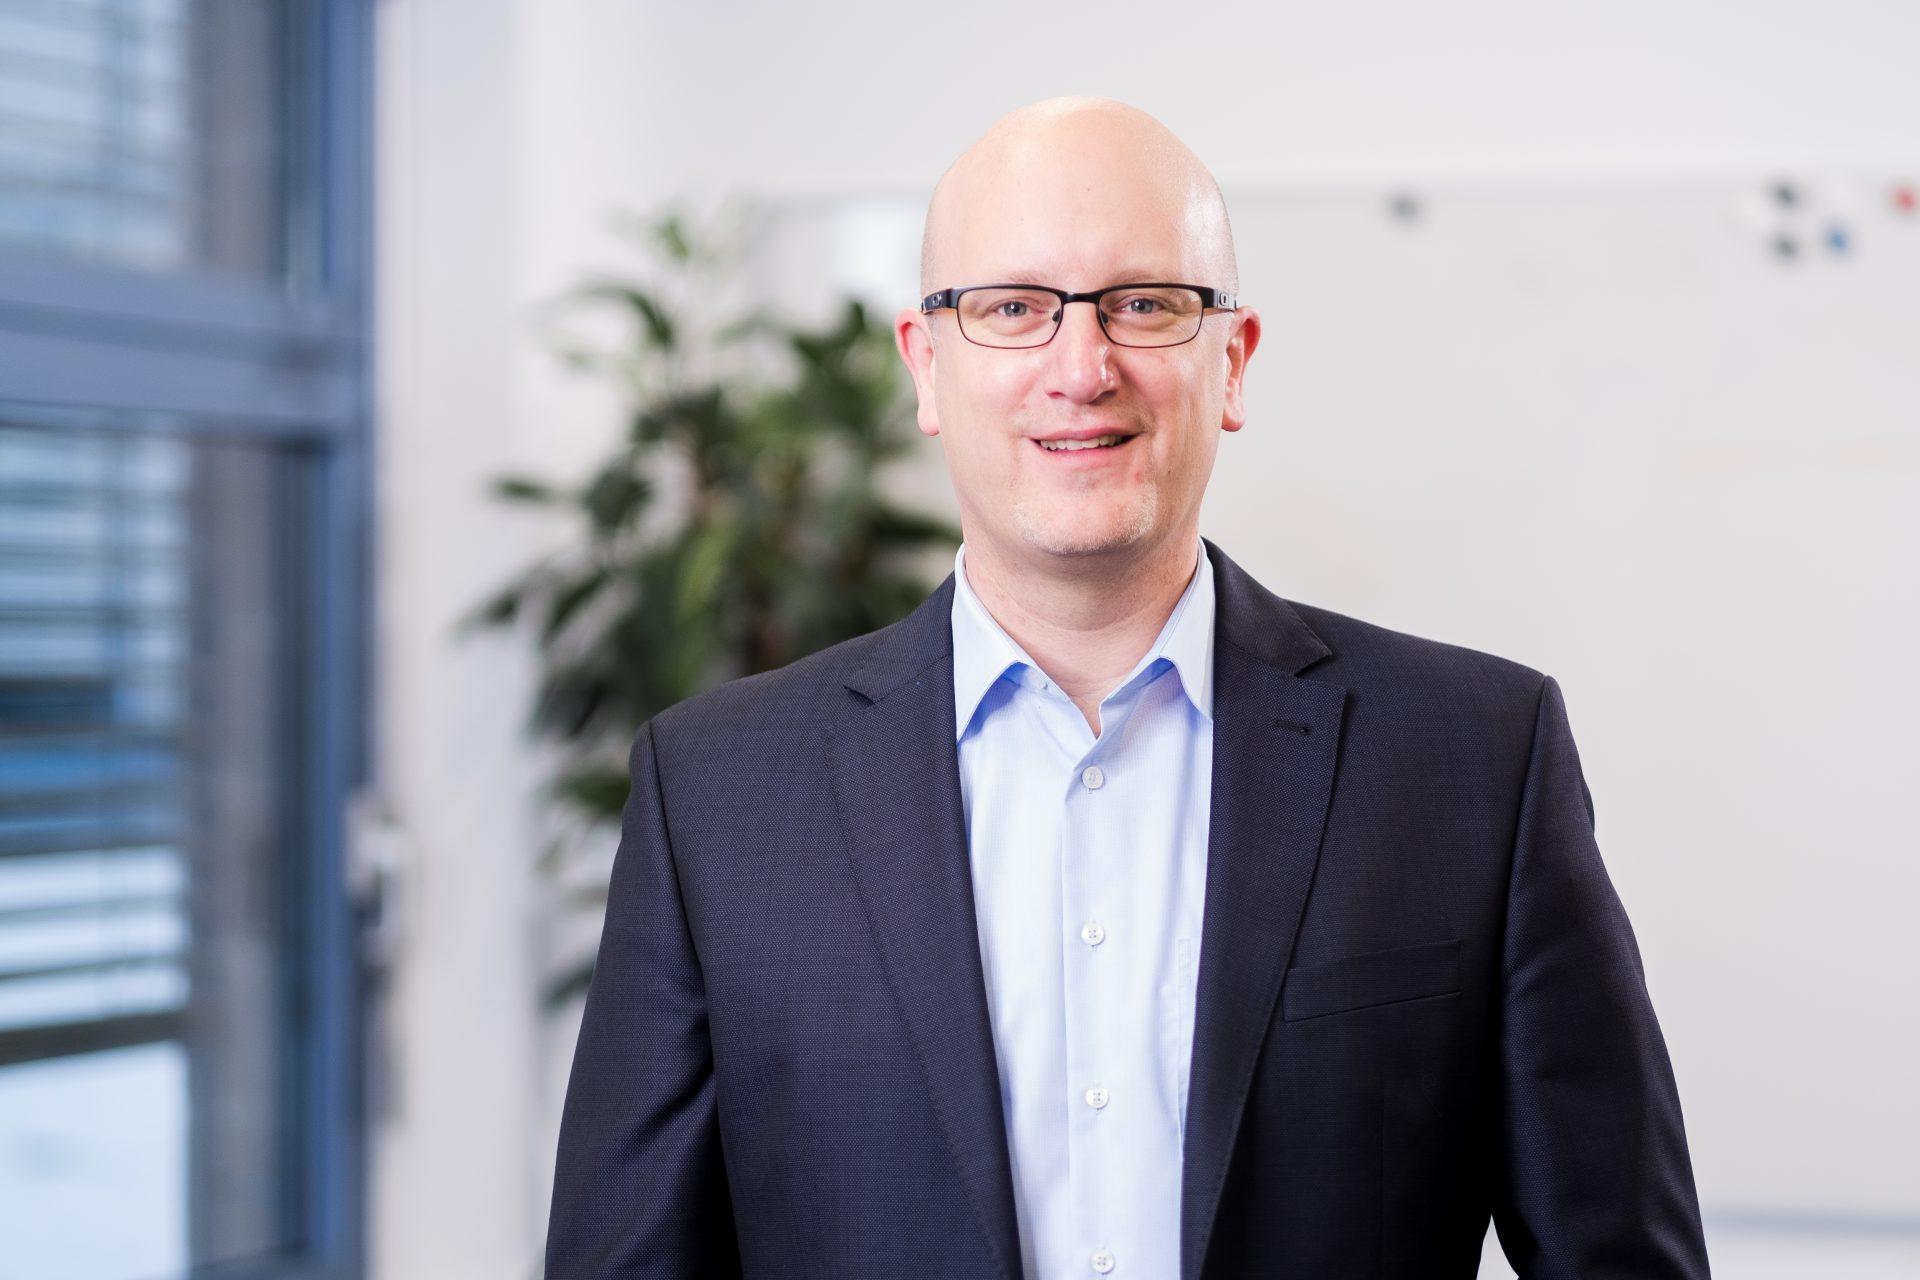 Jörg Schnermann